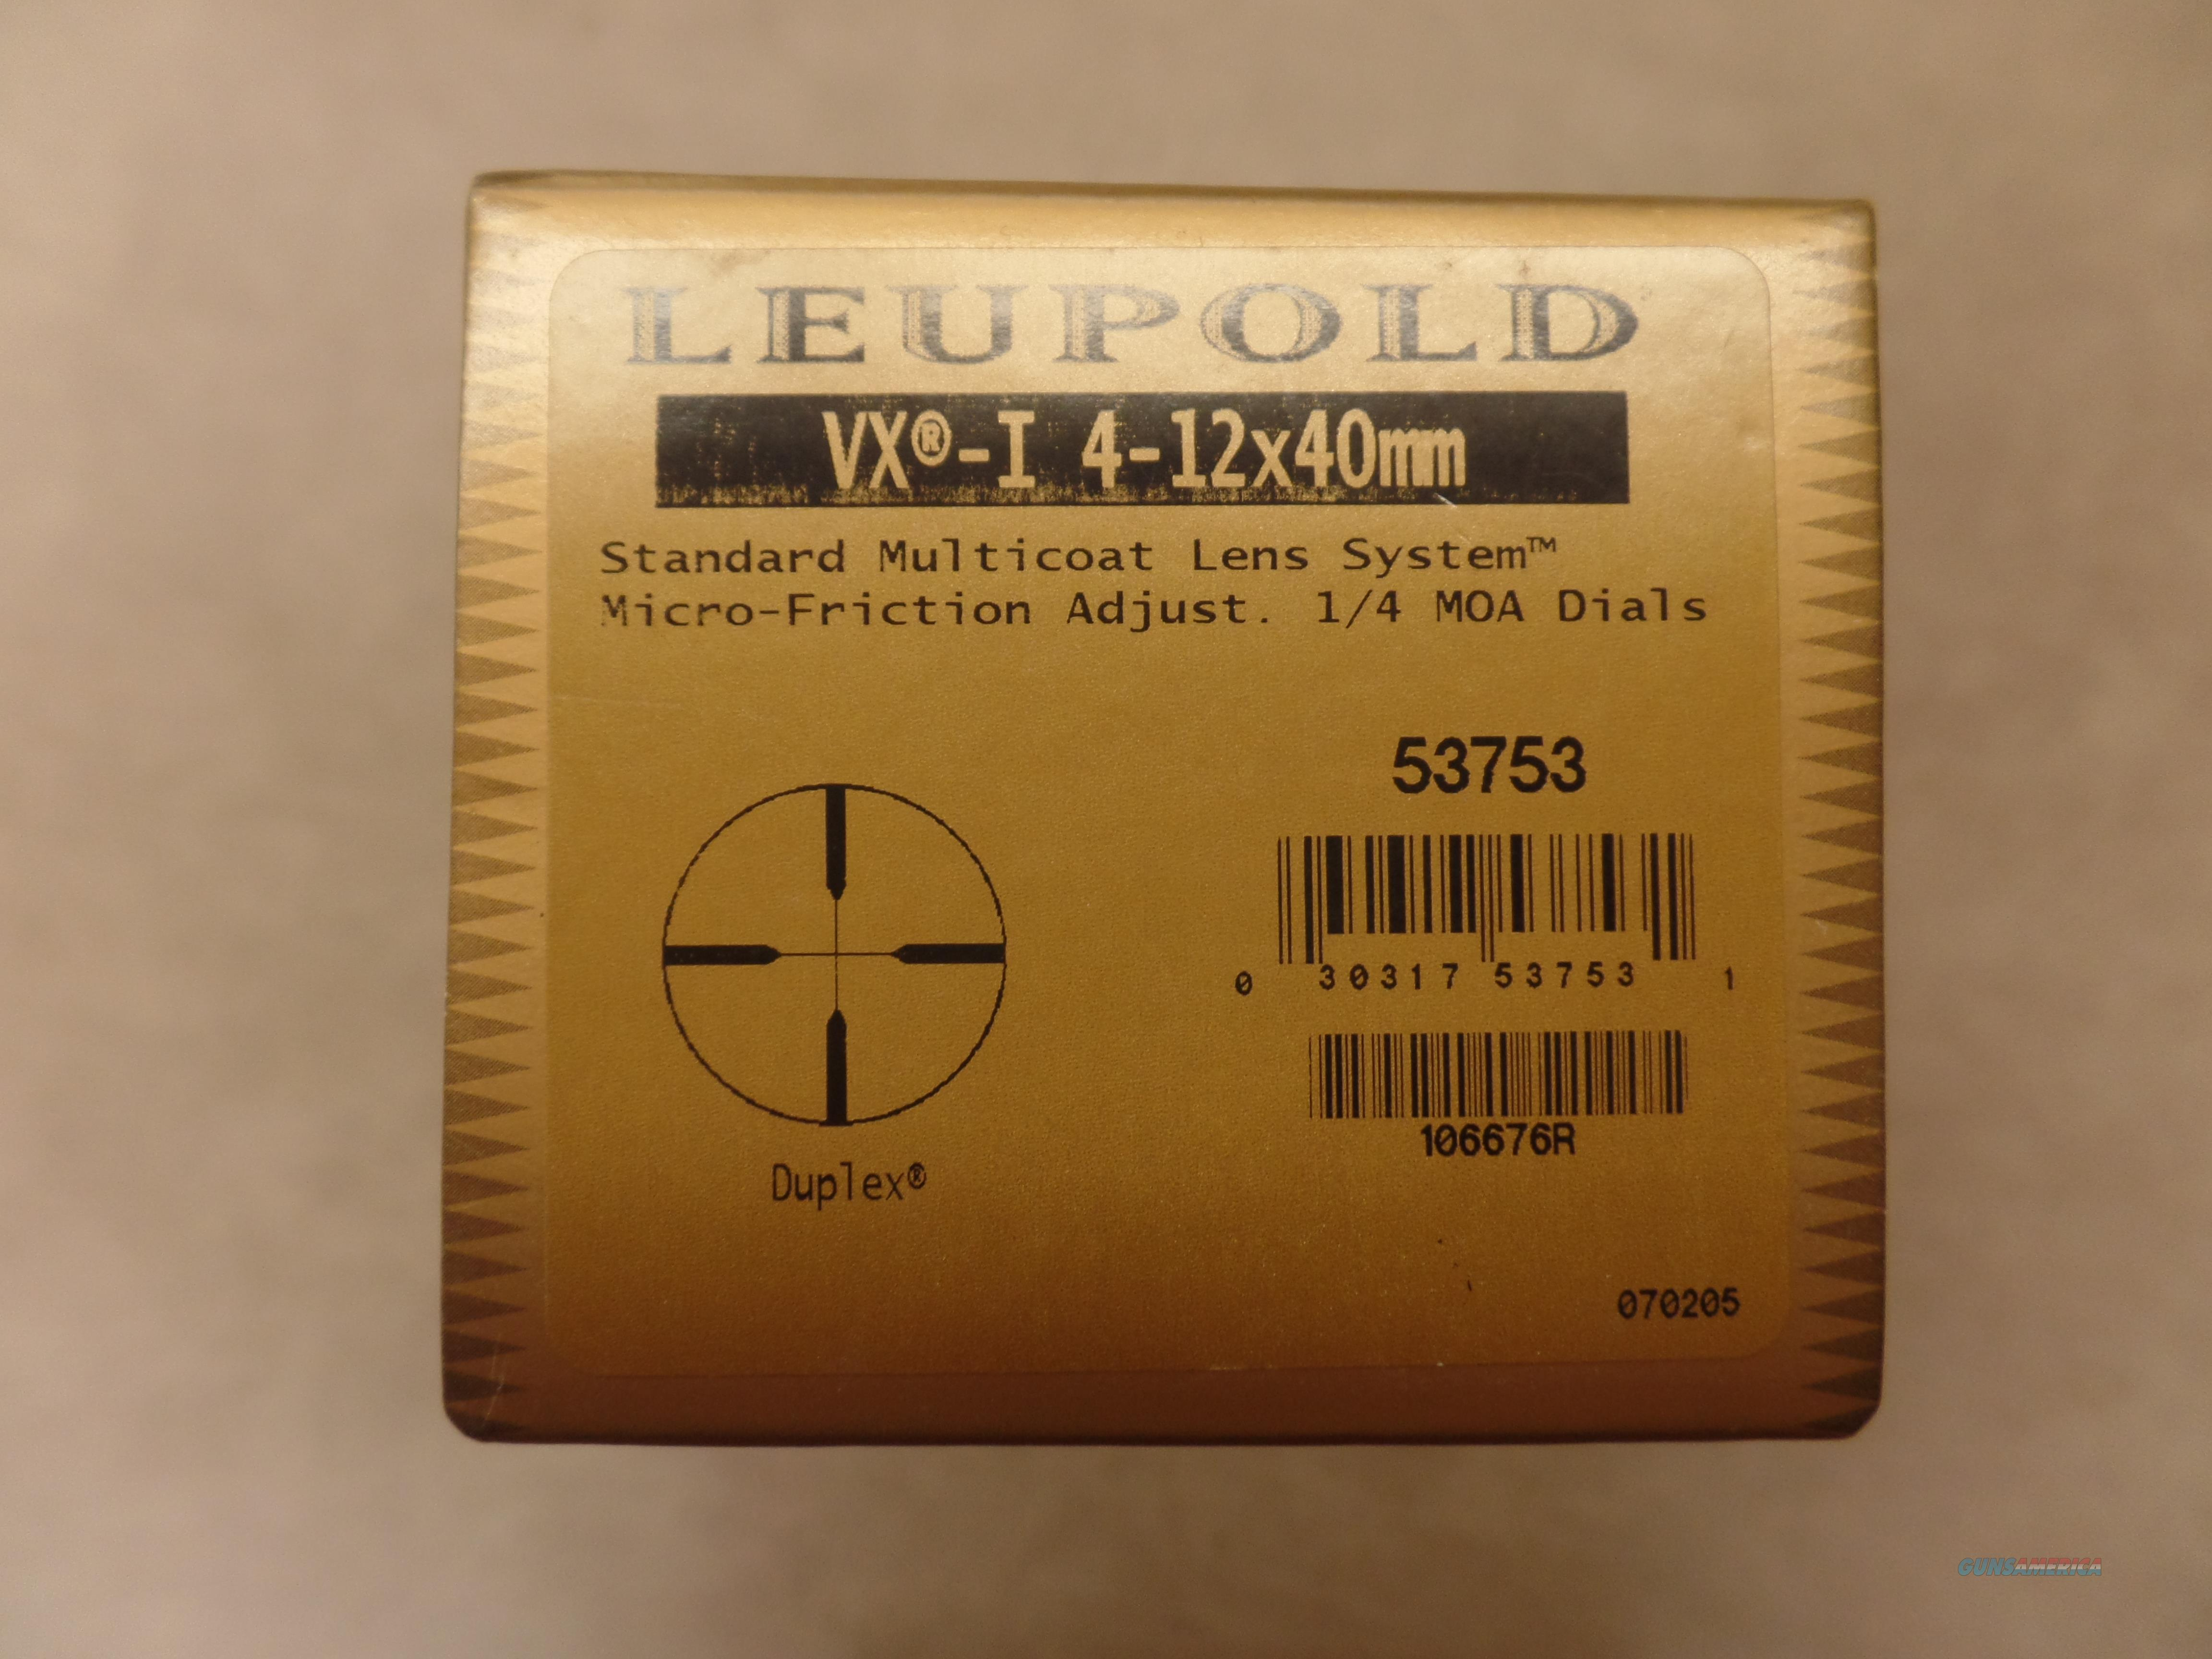 Leupold 100 Anniversary VX-1 4-12X40 Gloss  Non-Guns > Scopes/Mounts/Rings & Optics > Rifle Scopes > Variable Focal Length